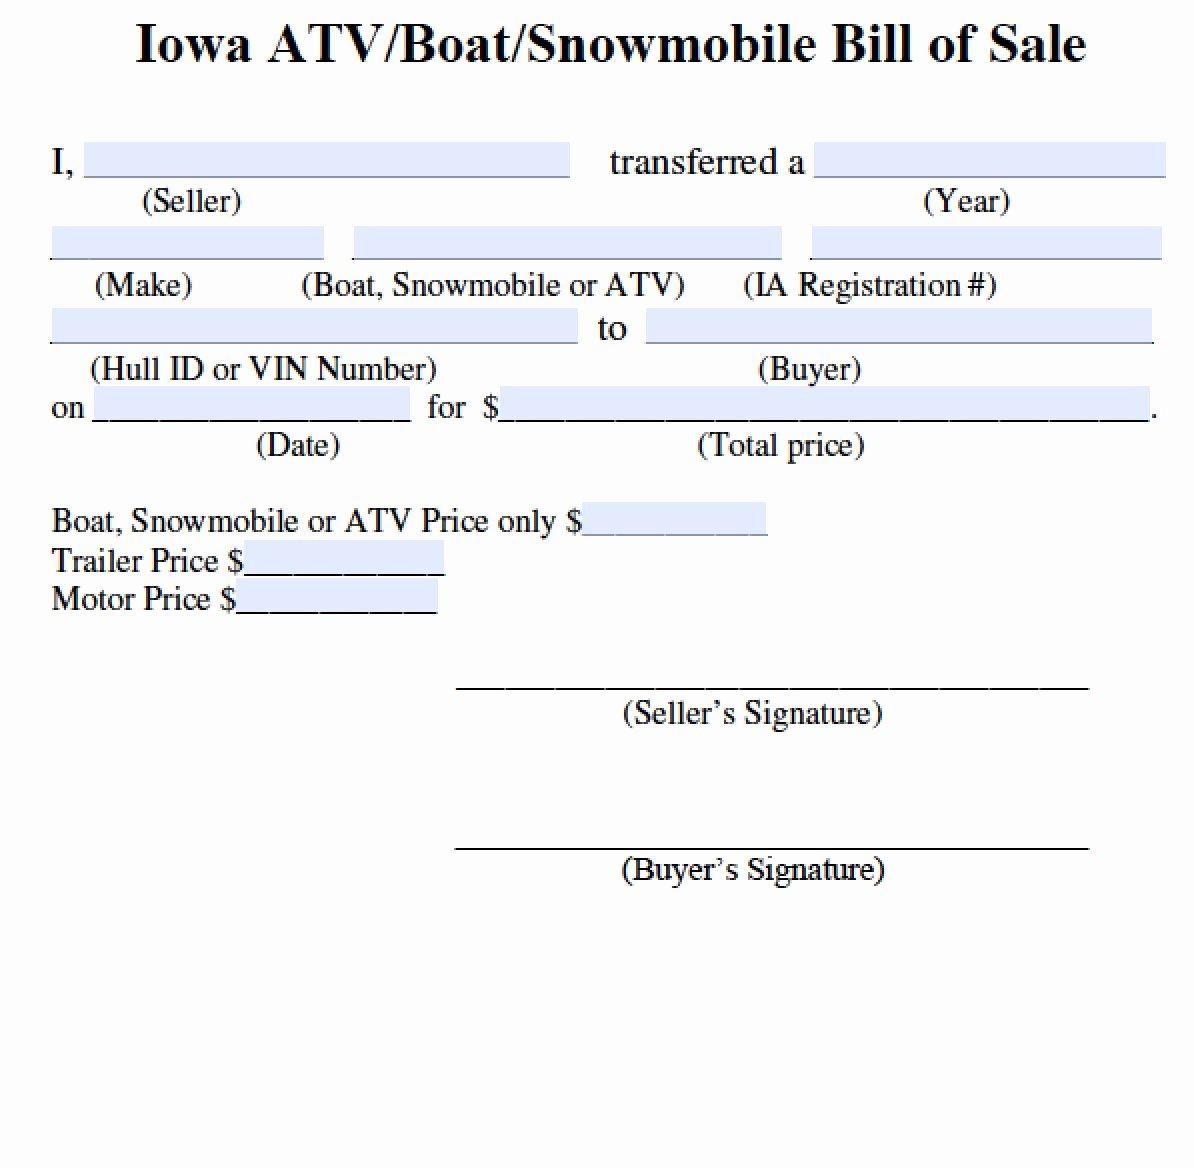 Jet Ski Bill Of Sale Best Of Free Iowa Bill Of Sale for atv Boat Snowmobile form Pdf